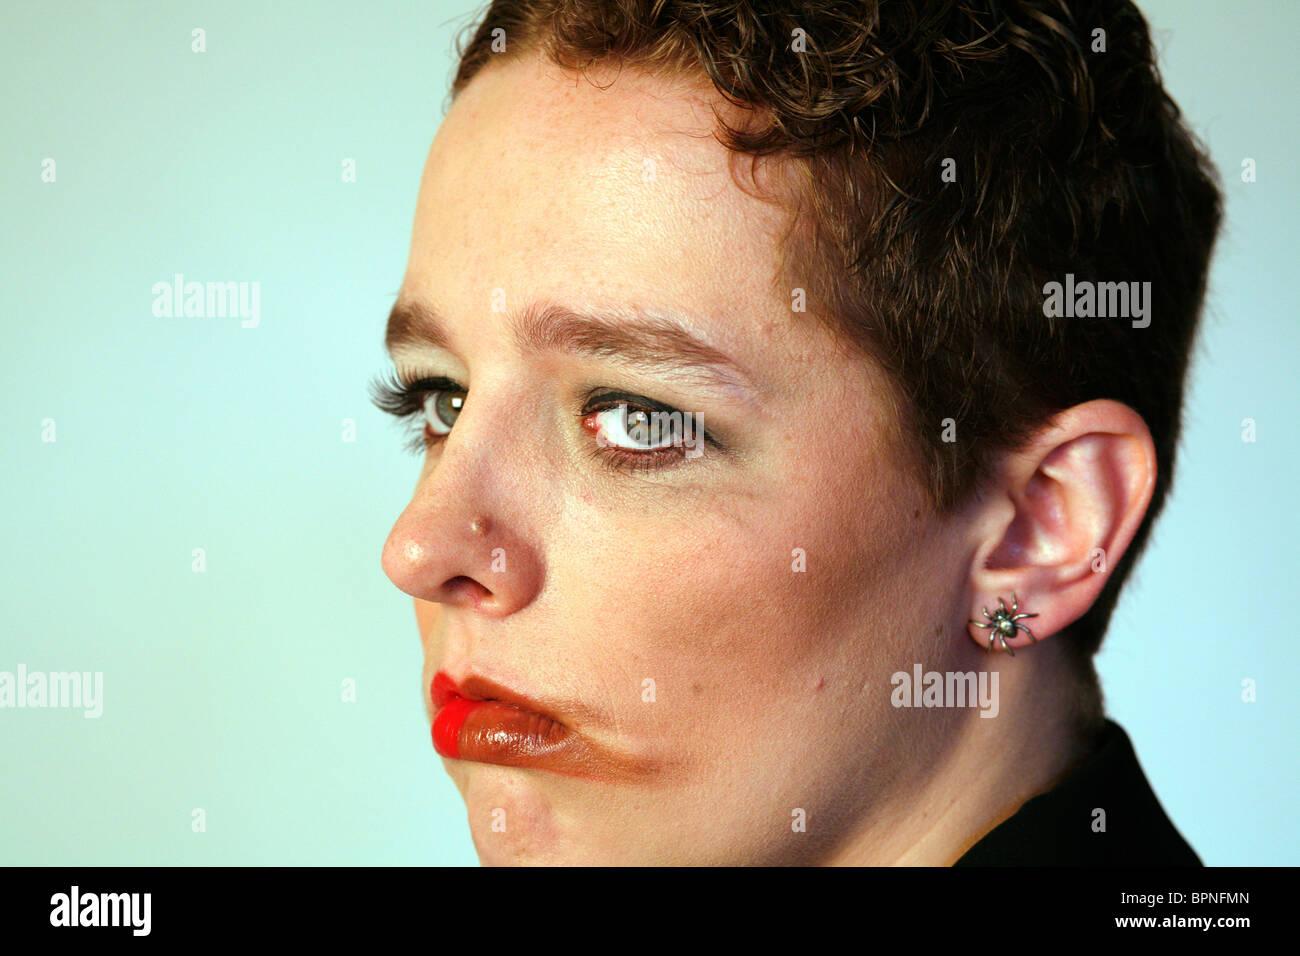 Cara con maquillaje manchado Imagen De Stock